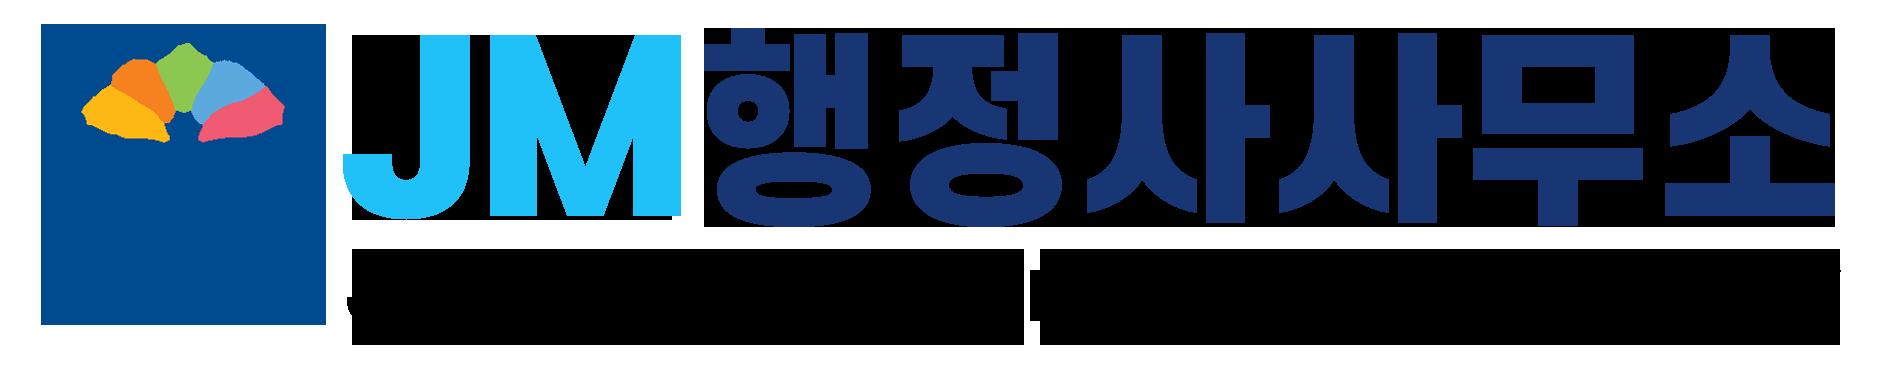 JM행정사사무소 LOGO